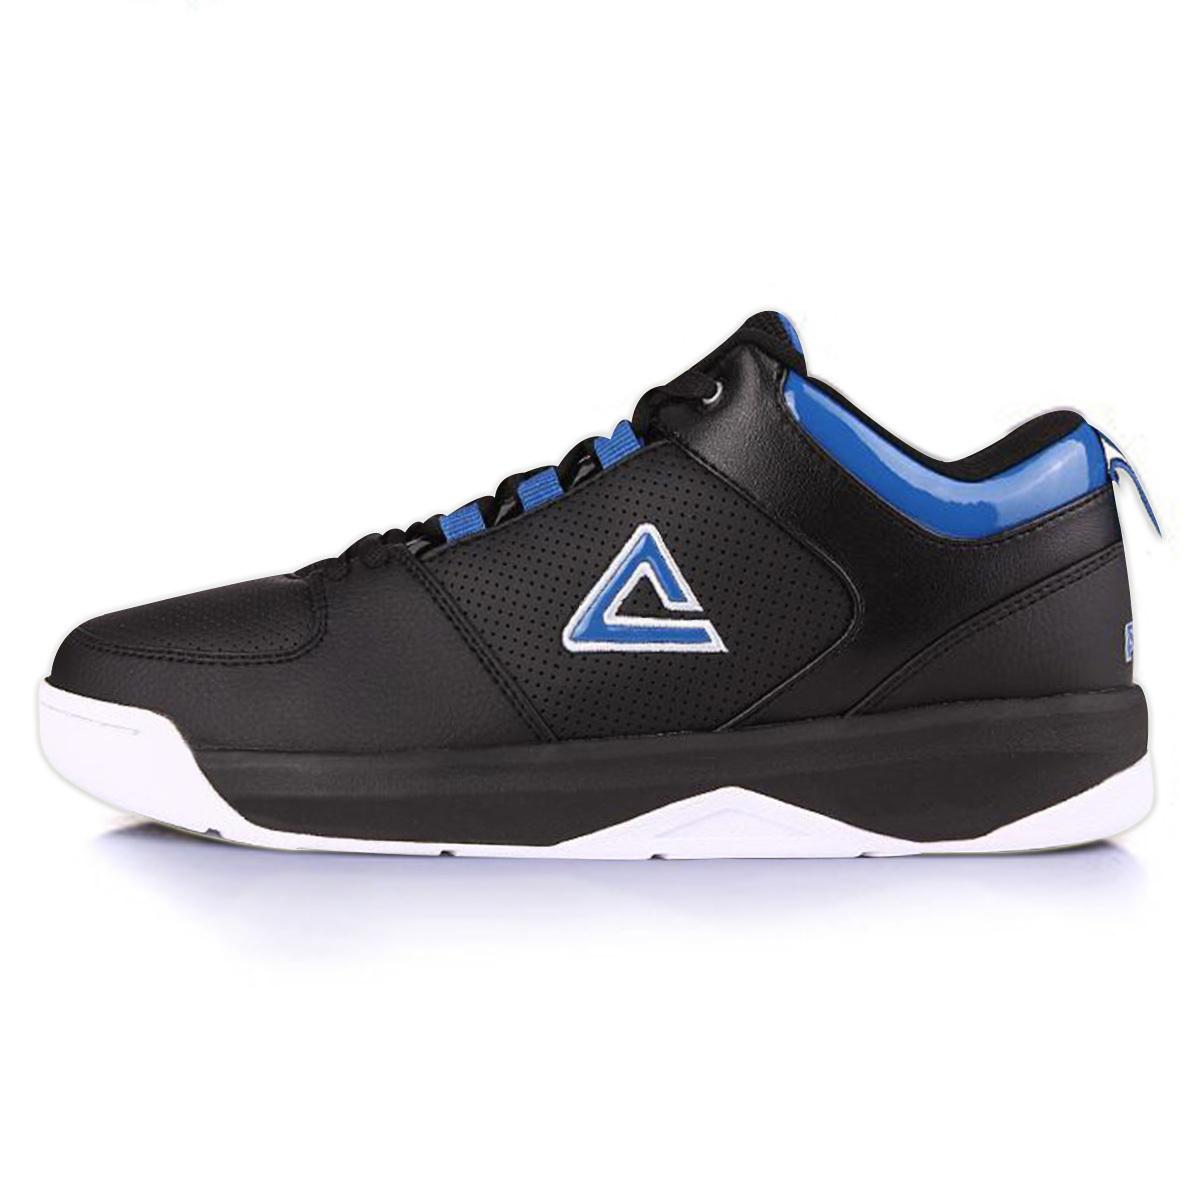 Peak/匹克 篮球鞋男正品 热卖室内鞋 耐磨篮球鞋 低帮透气运动鞋